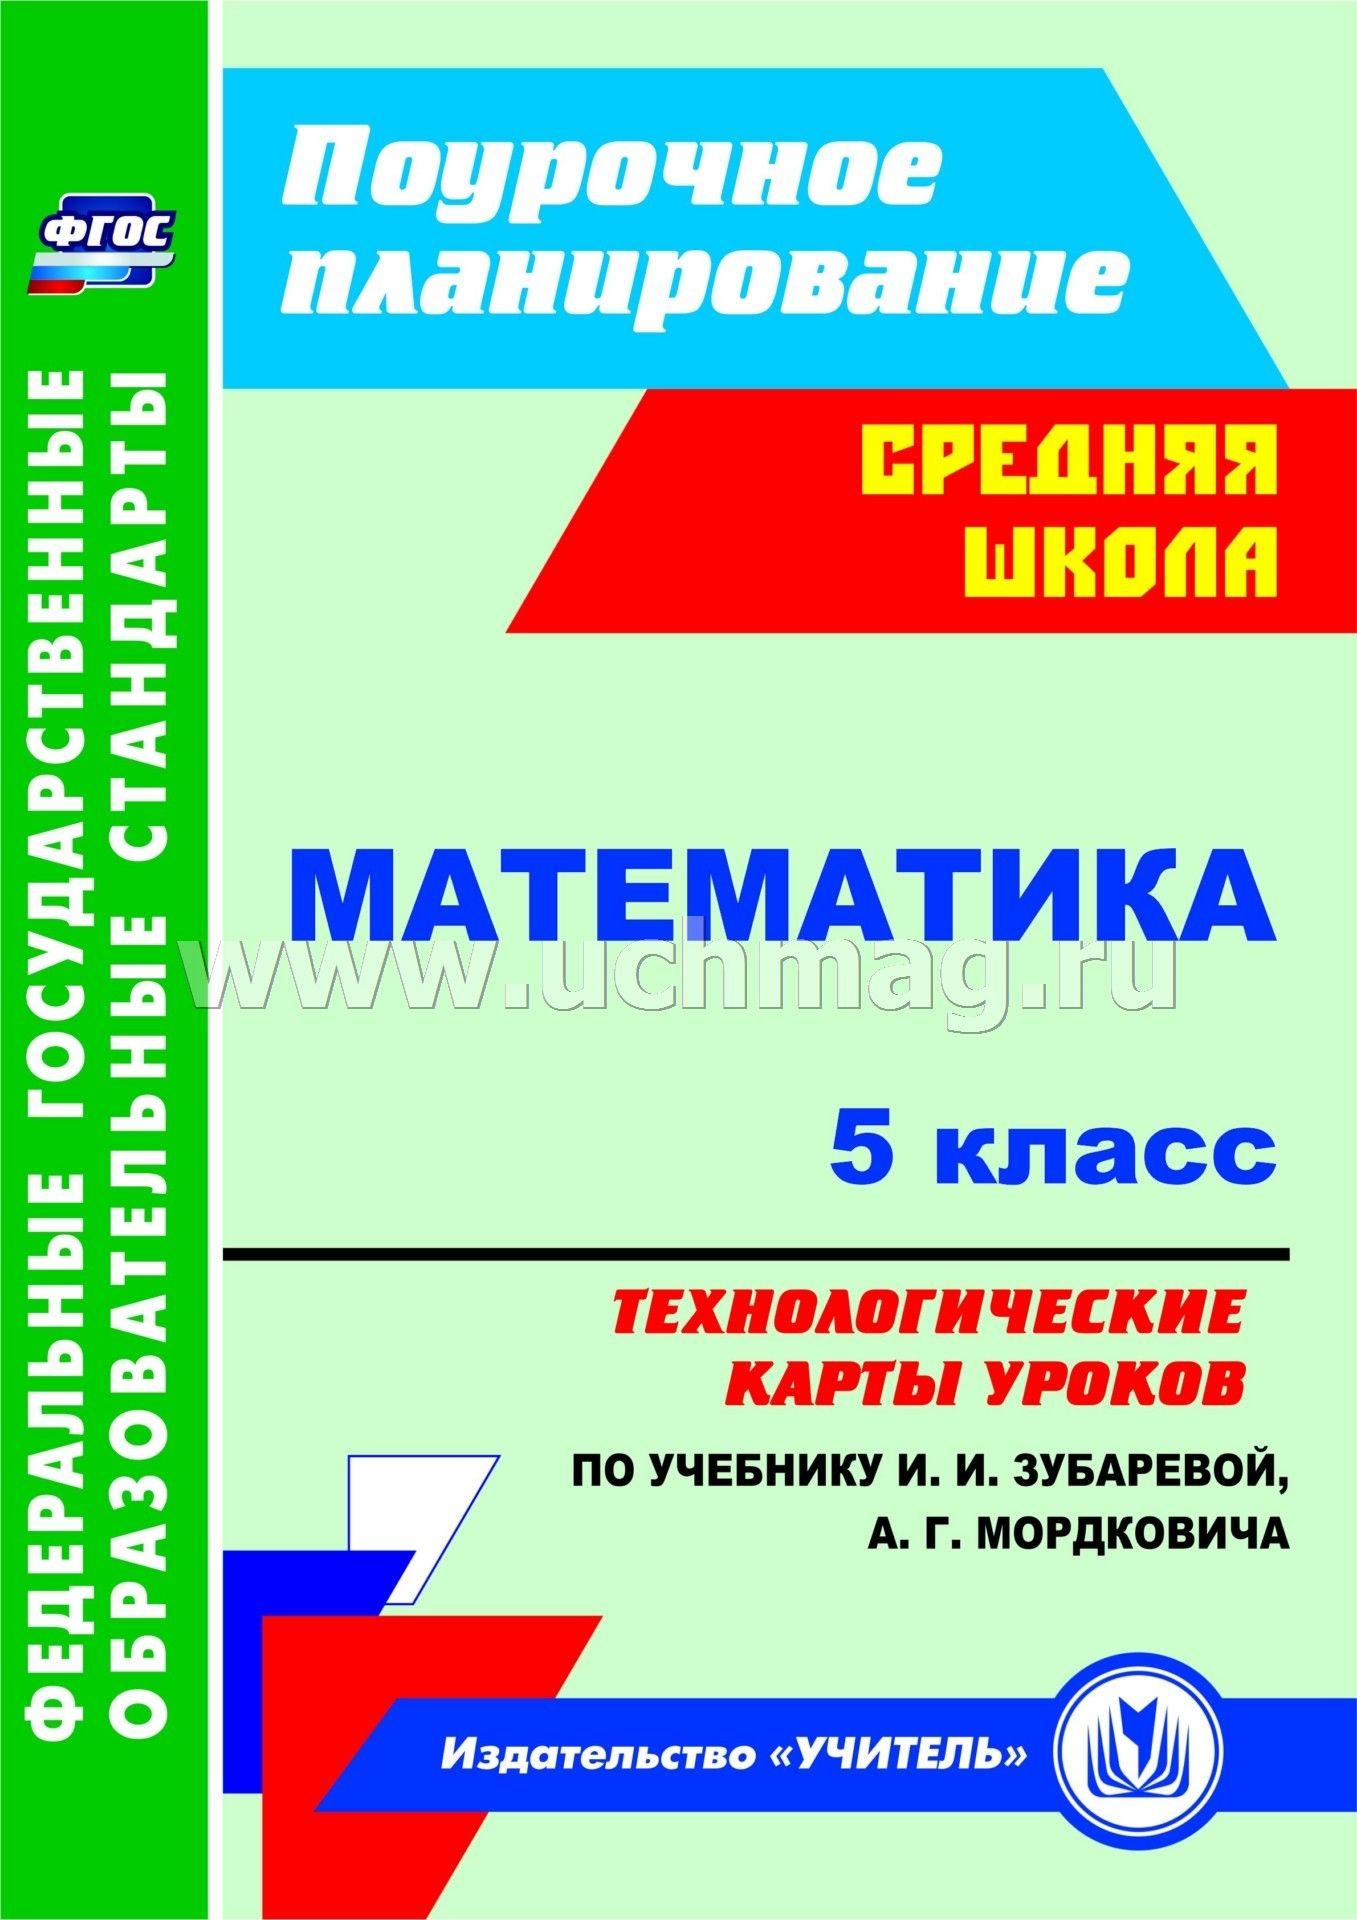 Уроки по математике 5 класс по фгос